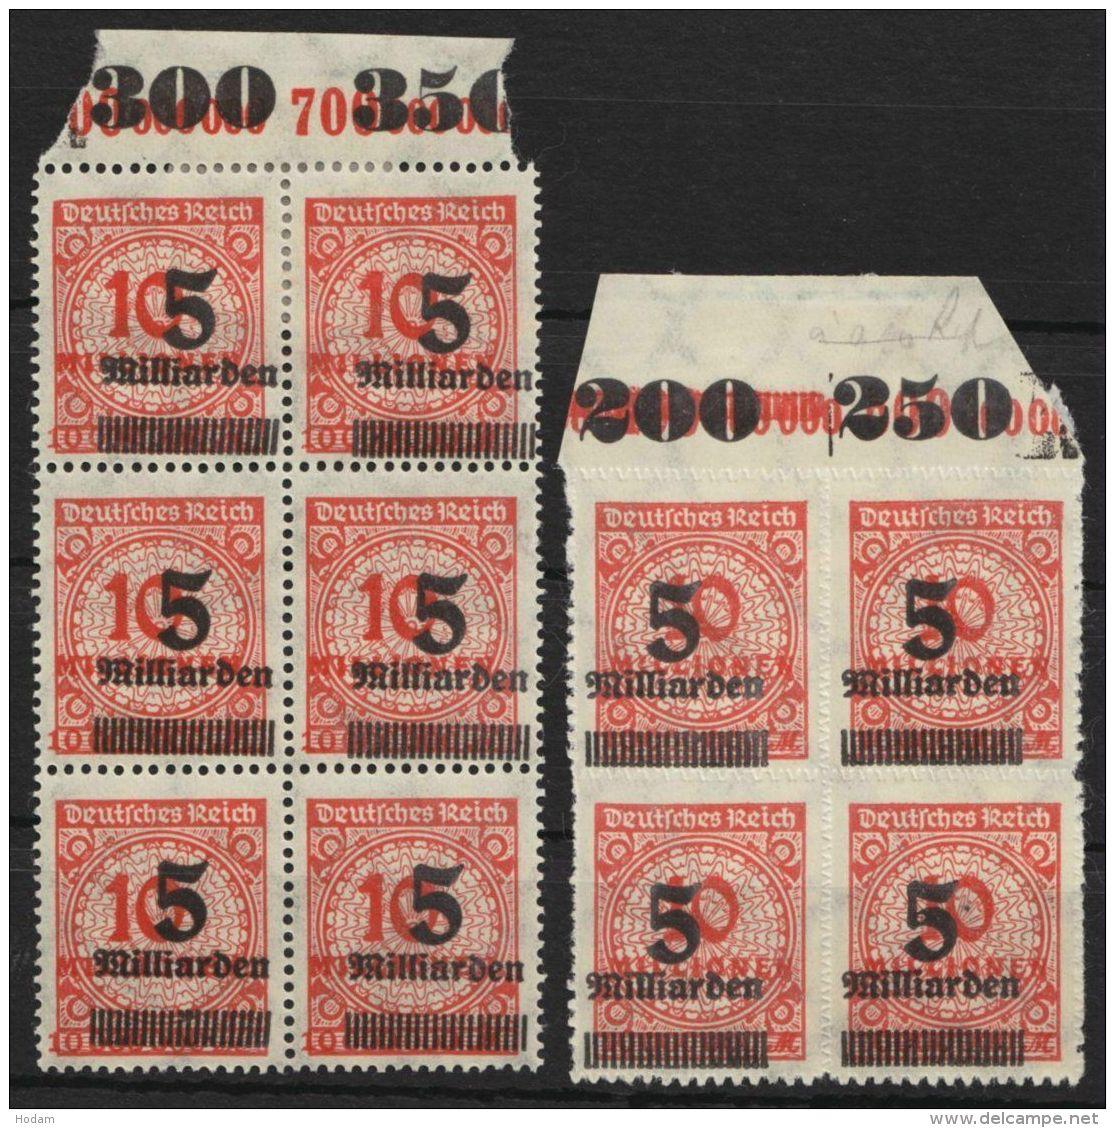 "334 A/B, Plattendruck, 6er Bzw. 4er Block Mit Oberrand ""Stettin"", Falz Im Rand,**/* - Deutschland"